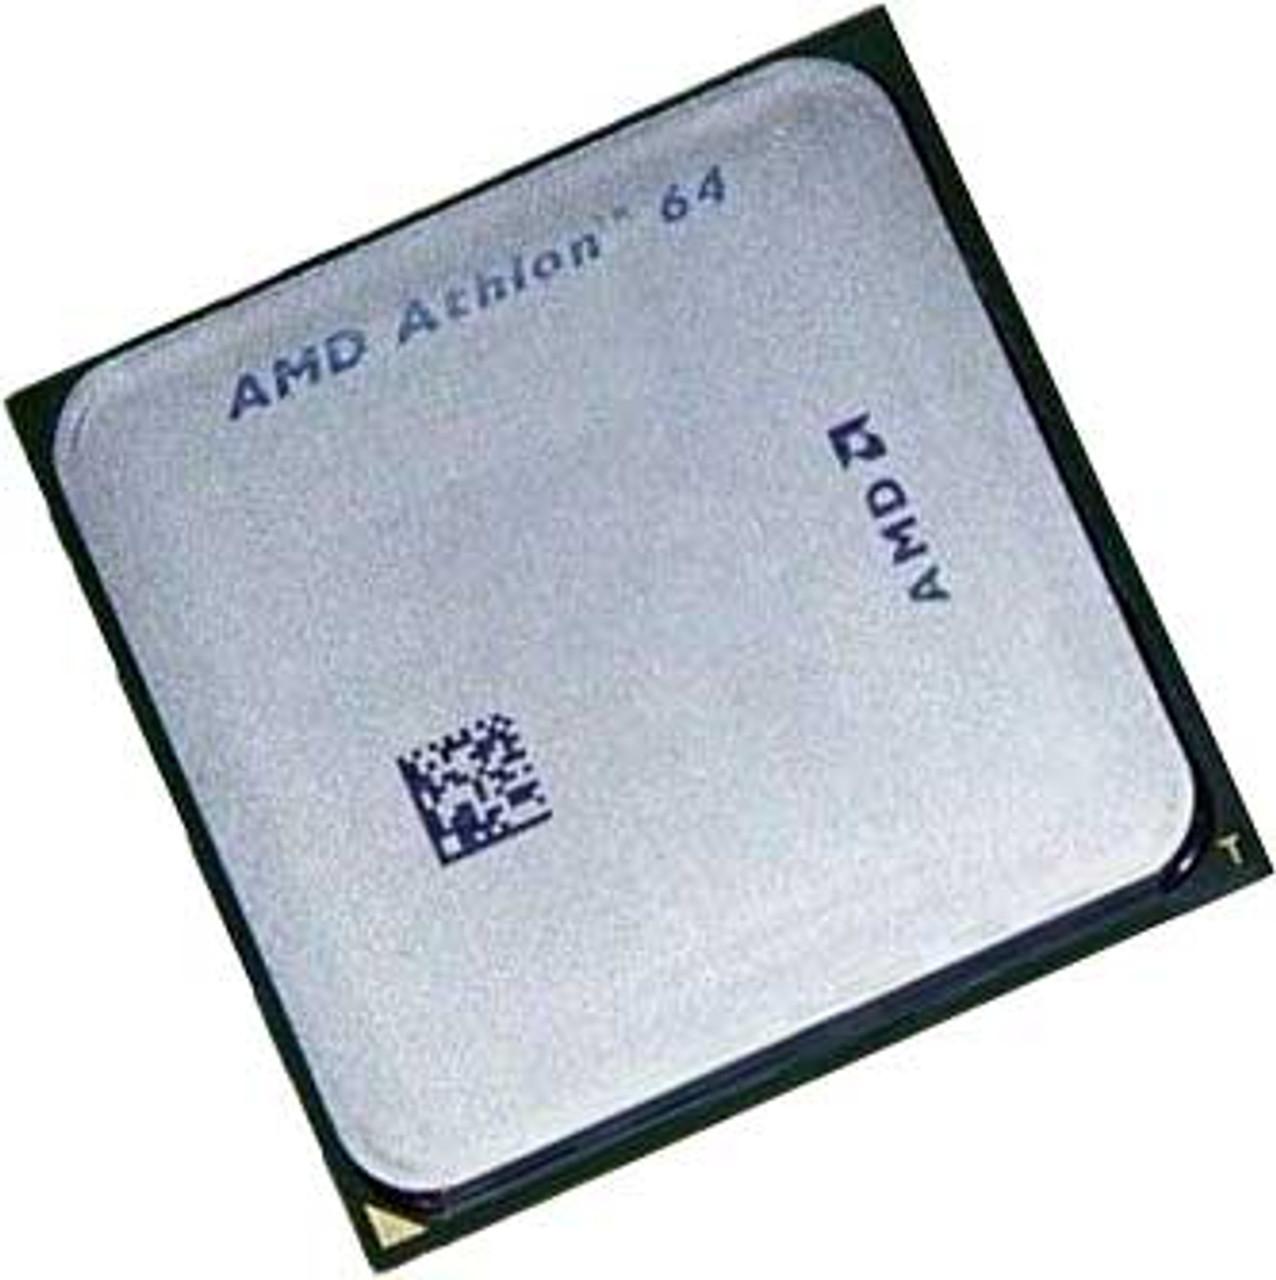 Amd Ada3400aep4ax 2 4ghz 512 Kb Socket 754 Athlon 64 3400 Cpu Processor Cpu Medics